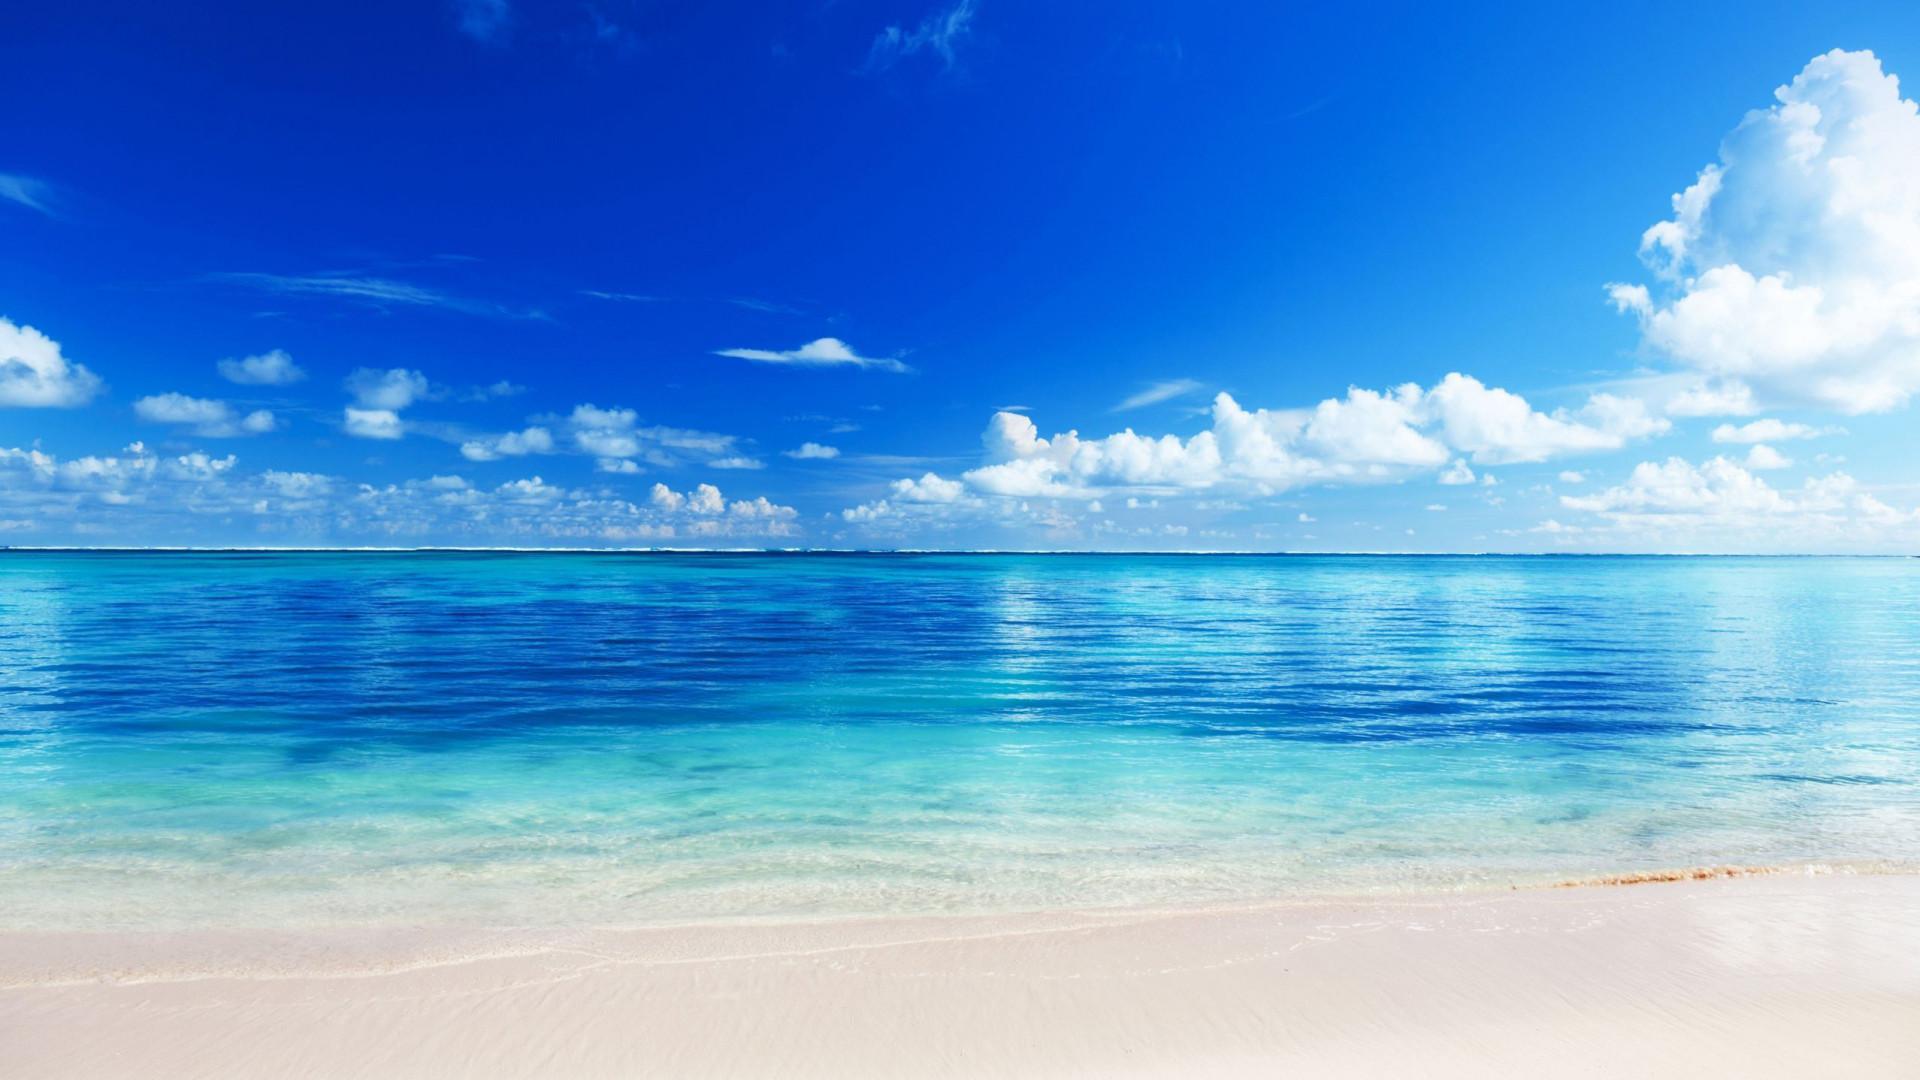 Hd Ocean Wallpapers · Hd Ocean Wallpapers free powerpoint background